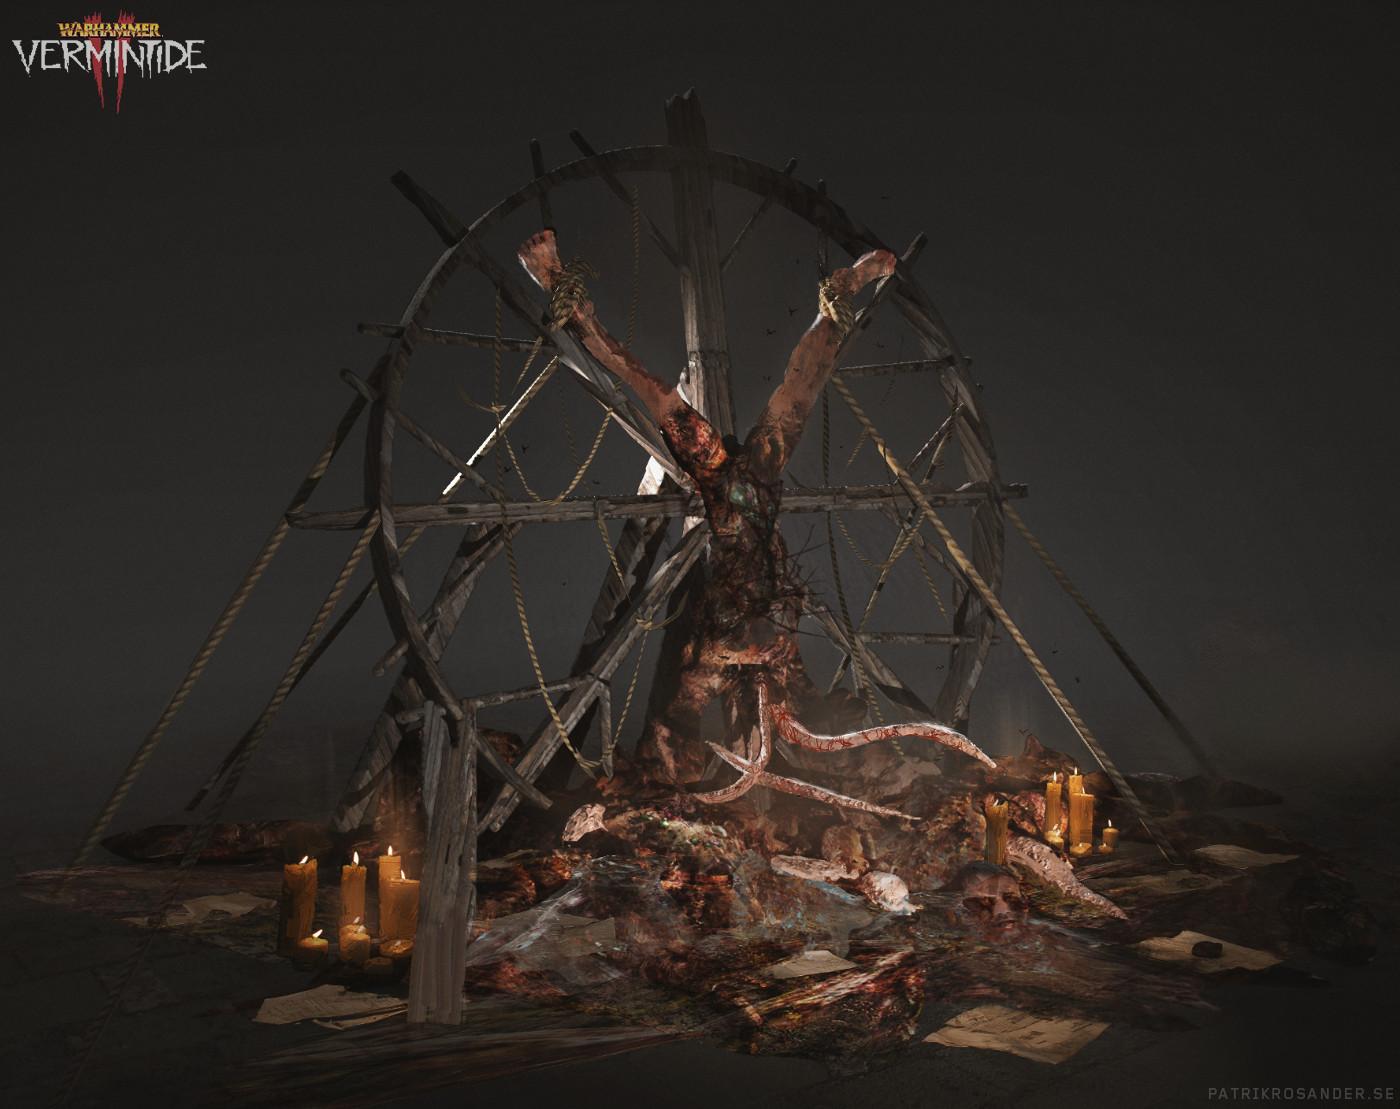 Patrik rosander convocation of decay catacombs ceremony 02